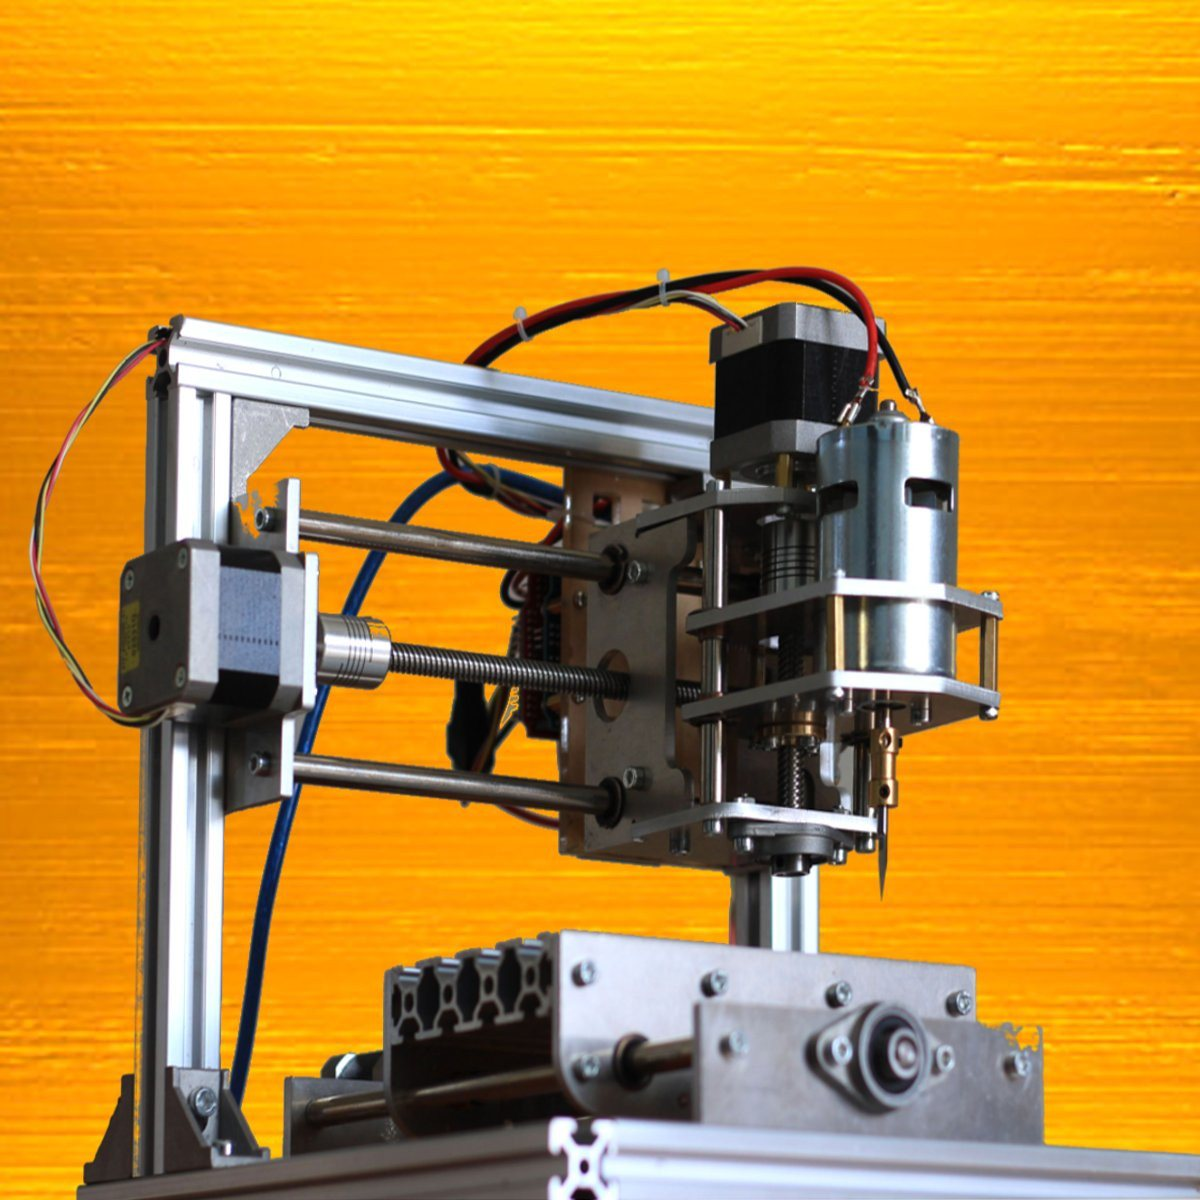 Мини 24 В 5A DIY 3 осевое гравер гравировка машины 130x100x40 мм PCB фрезерный дерево резьба гравировка маршрутизатор комплект для Grbl доска